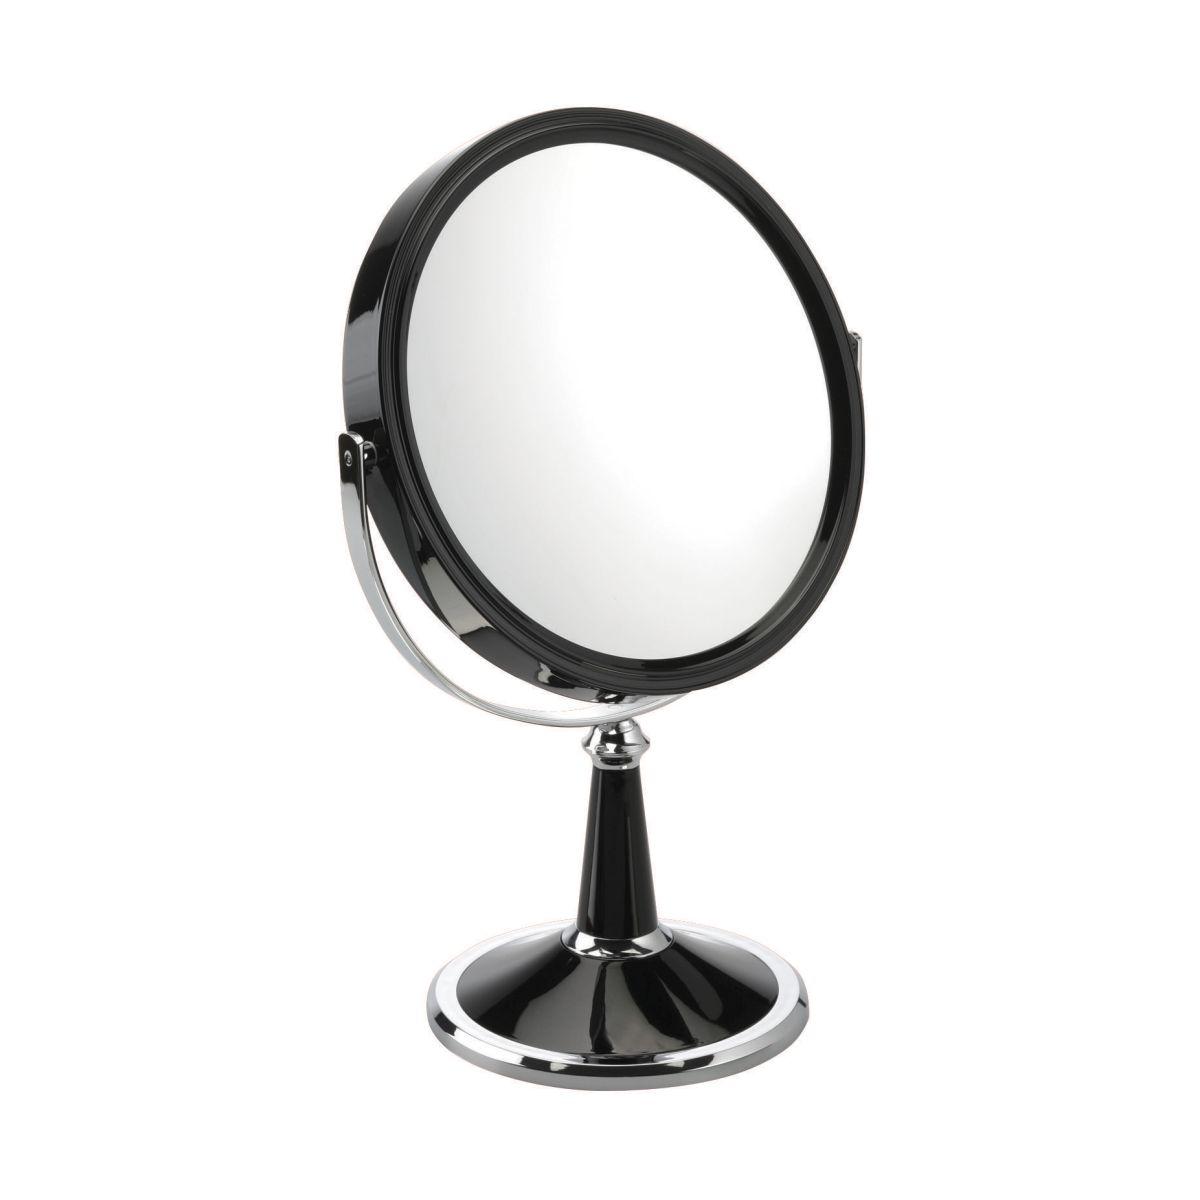 1009 20 BLKX10 1 - Milly' 10x Magnification Pedestal Mirror - 100920B